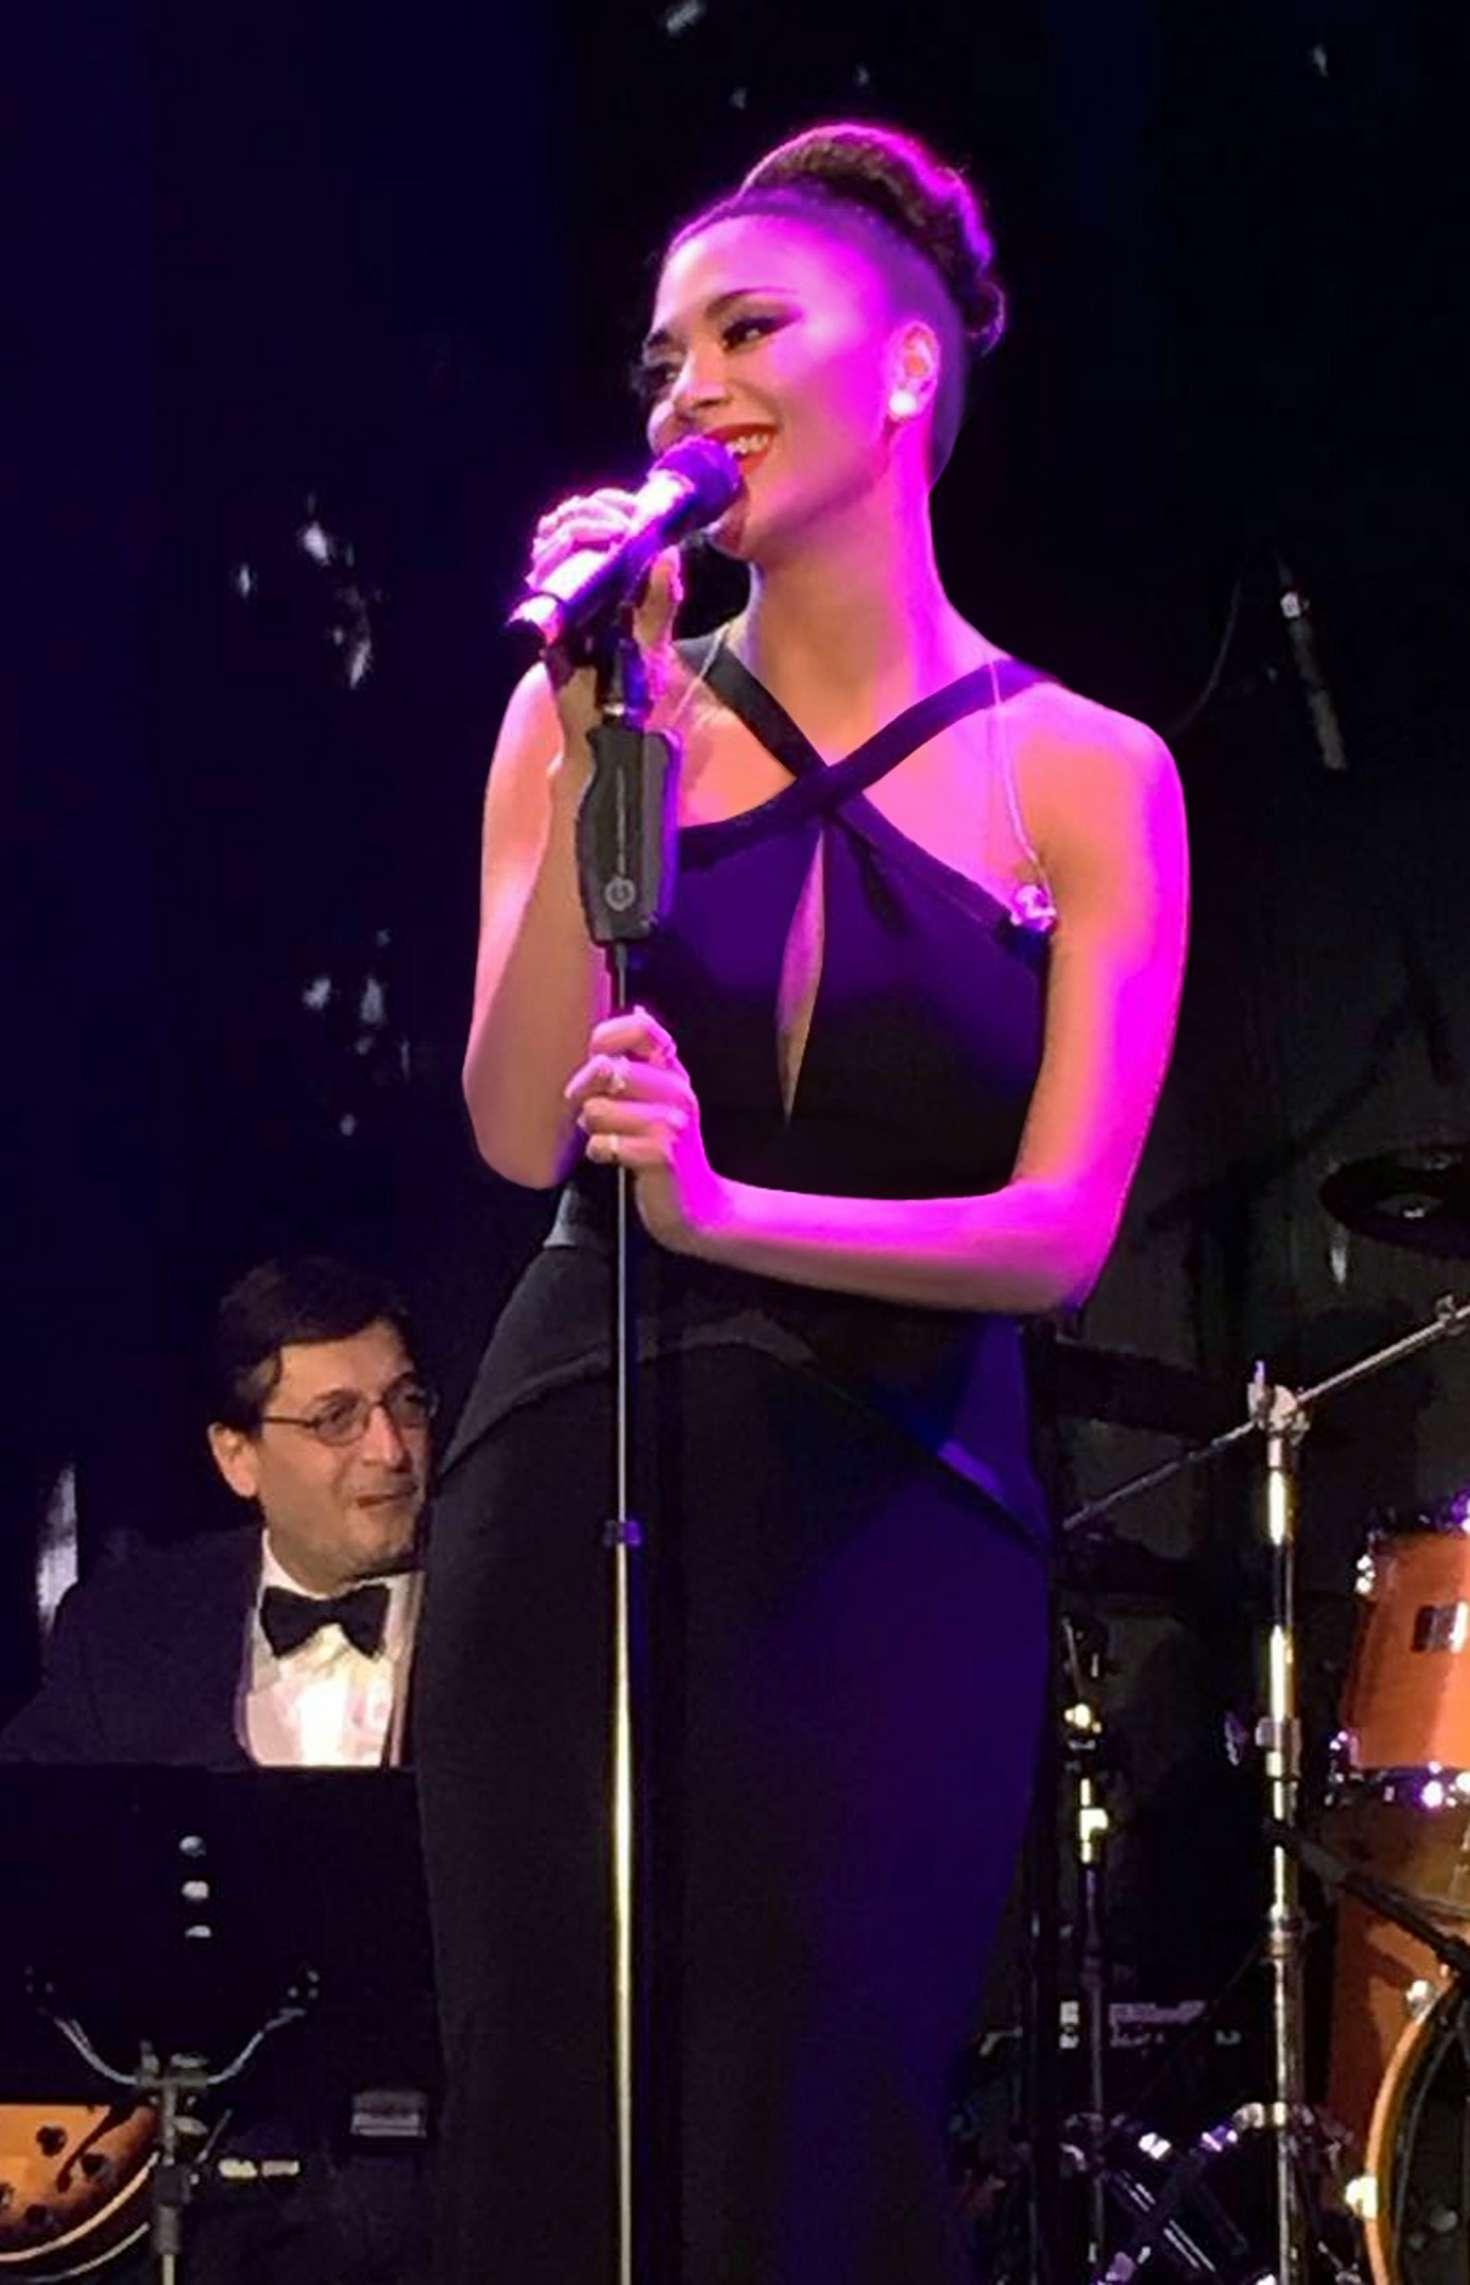 Nicole Scherzinger - Performing at The Glock Horse Performance Center show in Austria